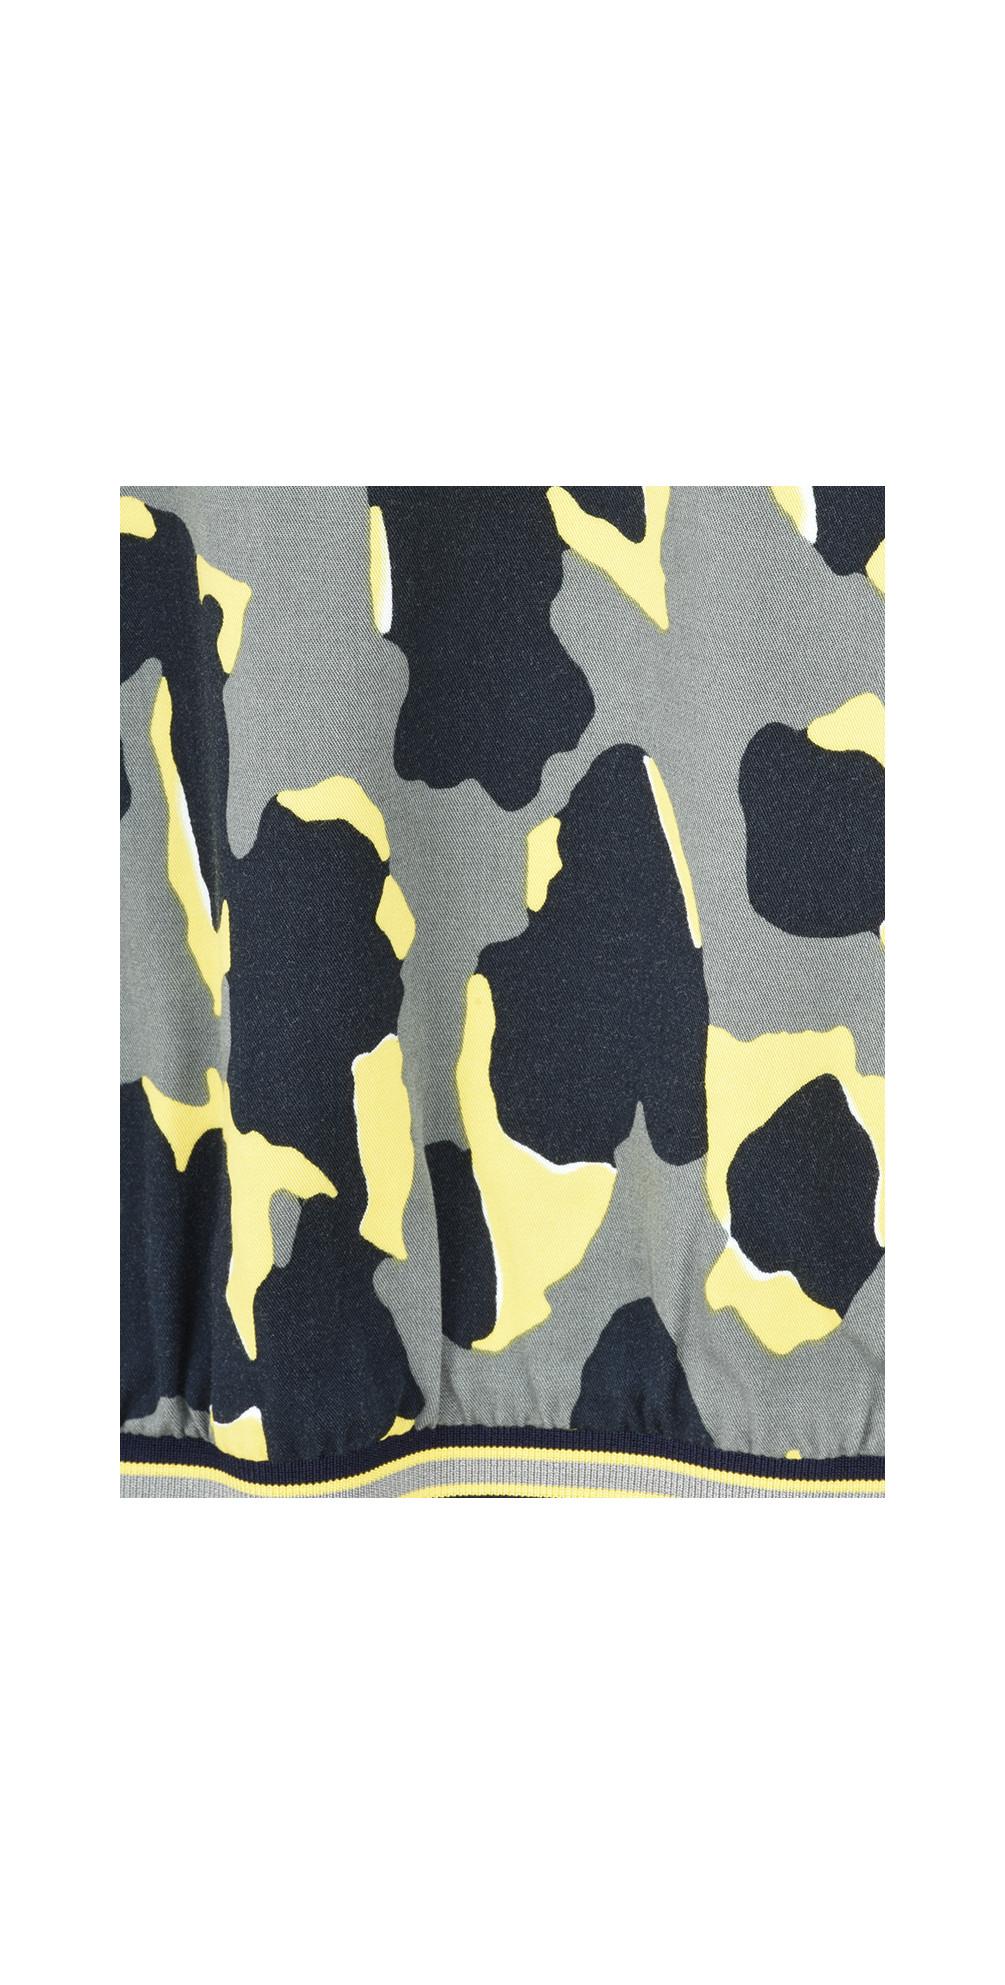 Abstract Animal Spot Print Blouse main image